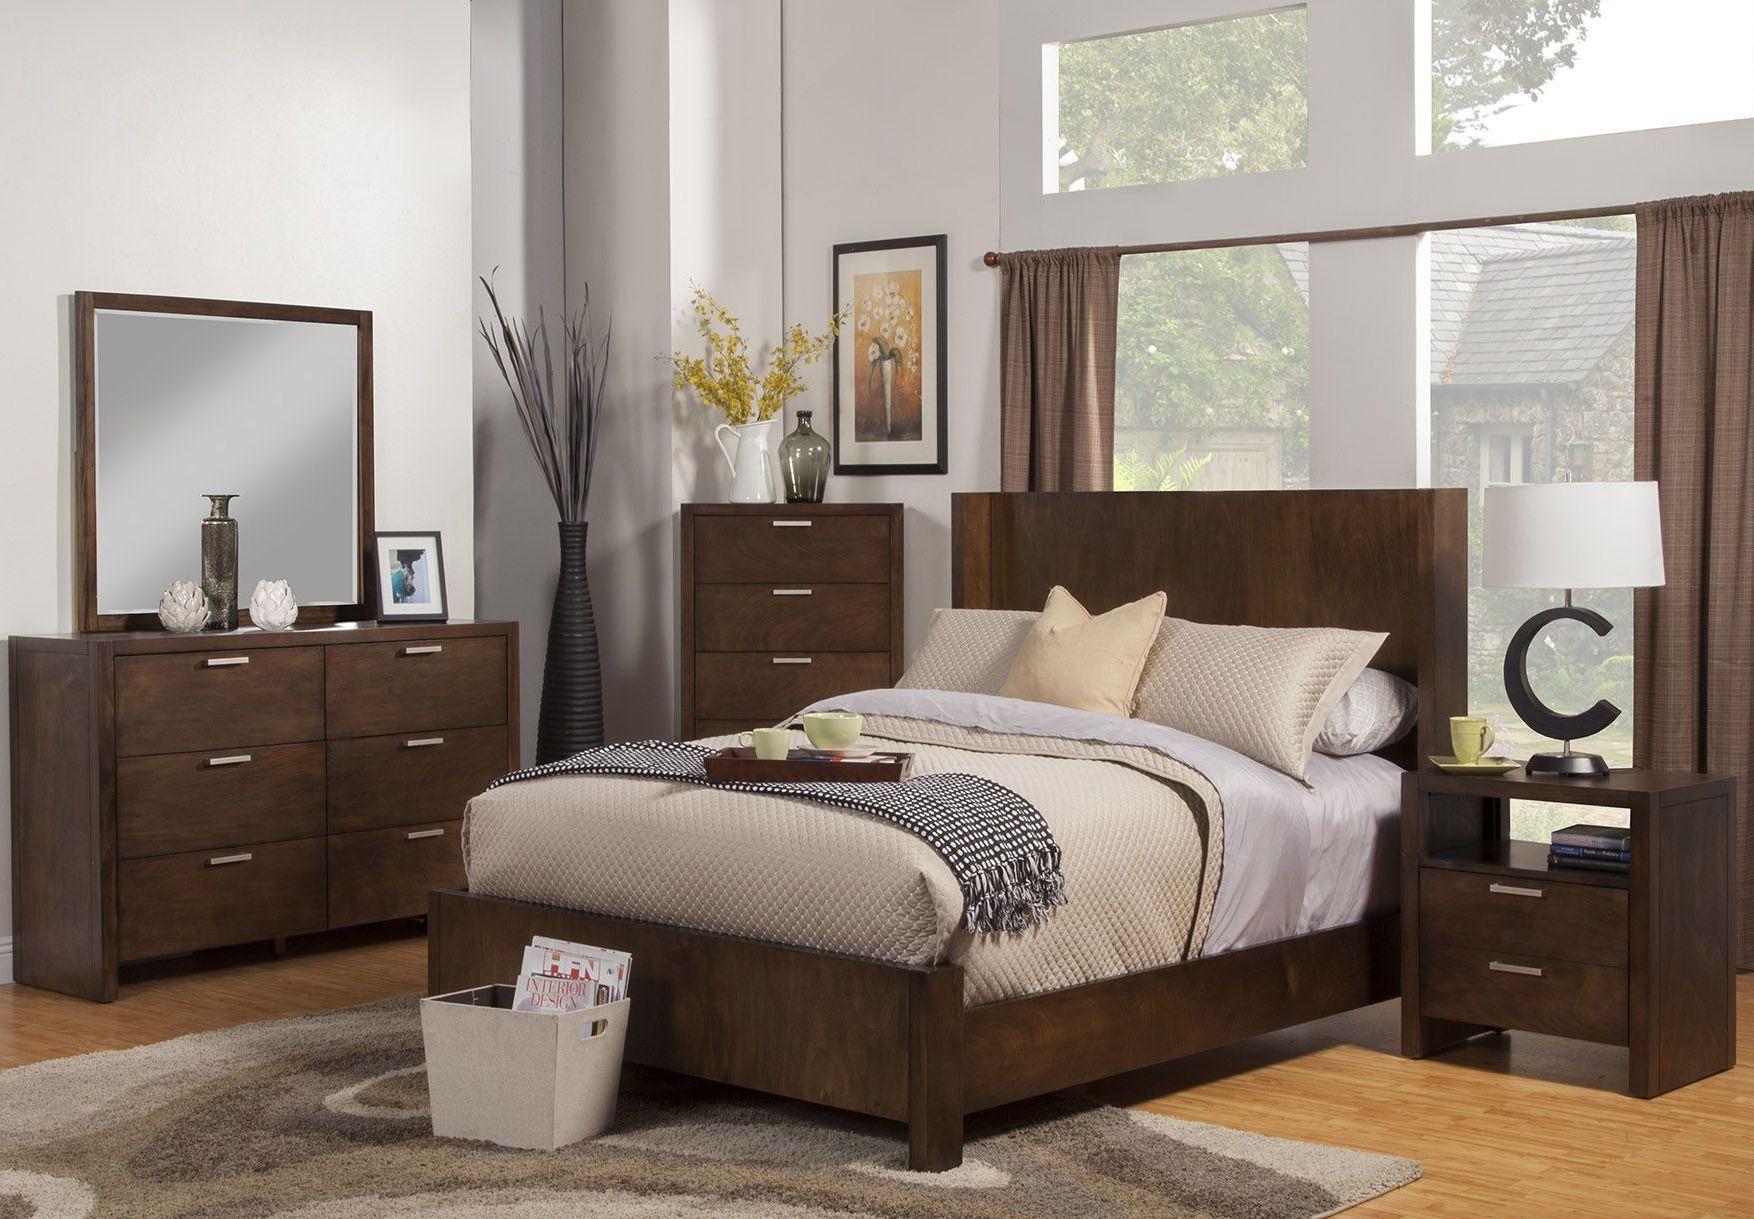 the most bobs furniture. Austin Bedroom Furniture austin bedroom furniture set countryside